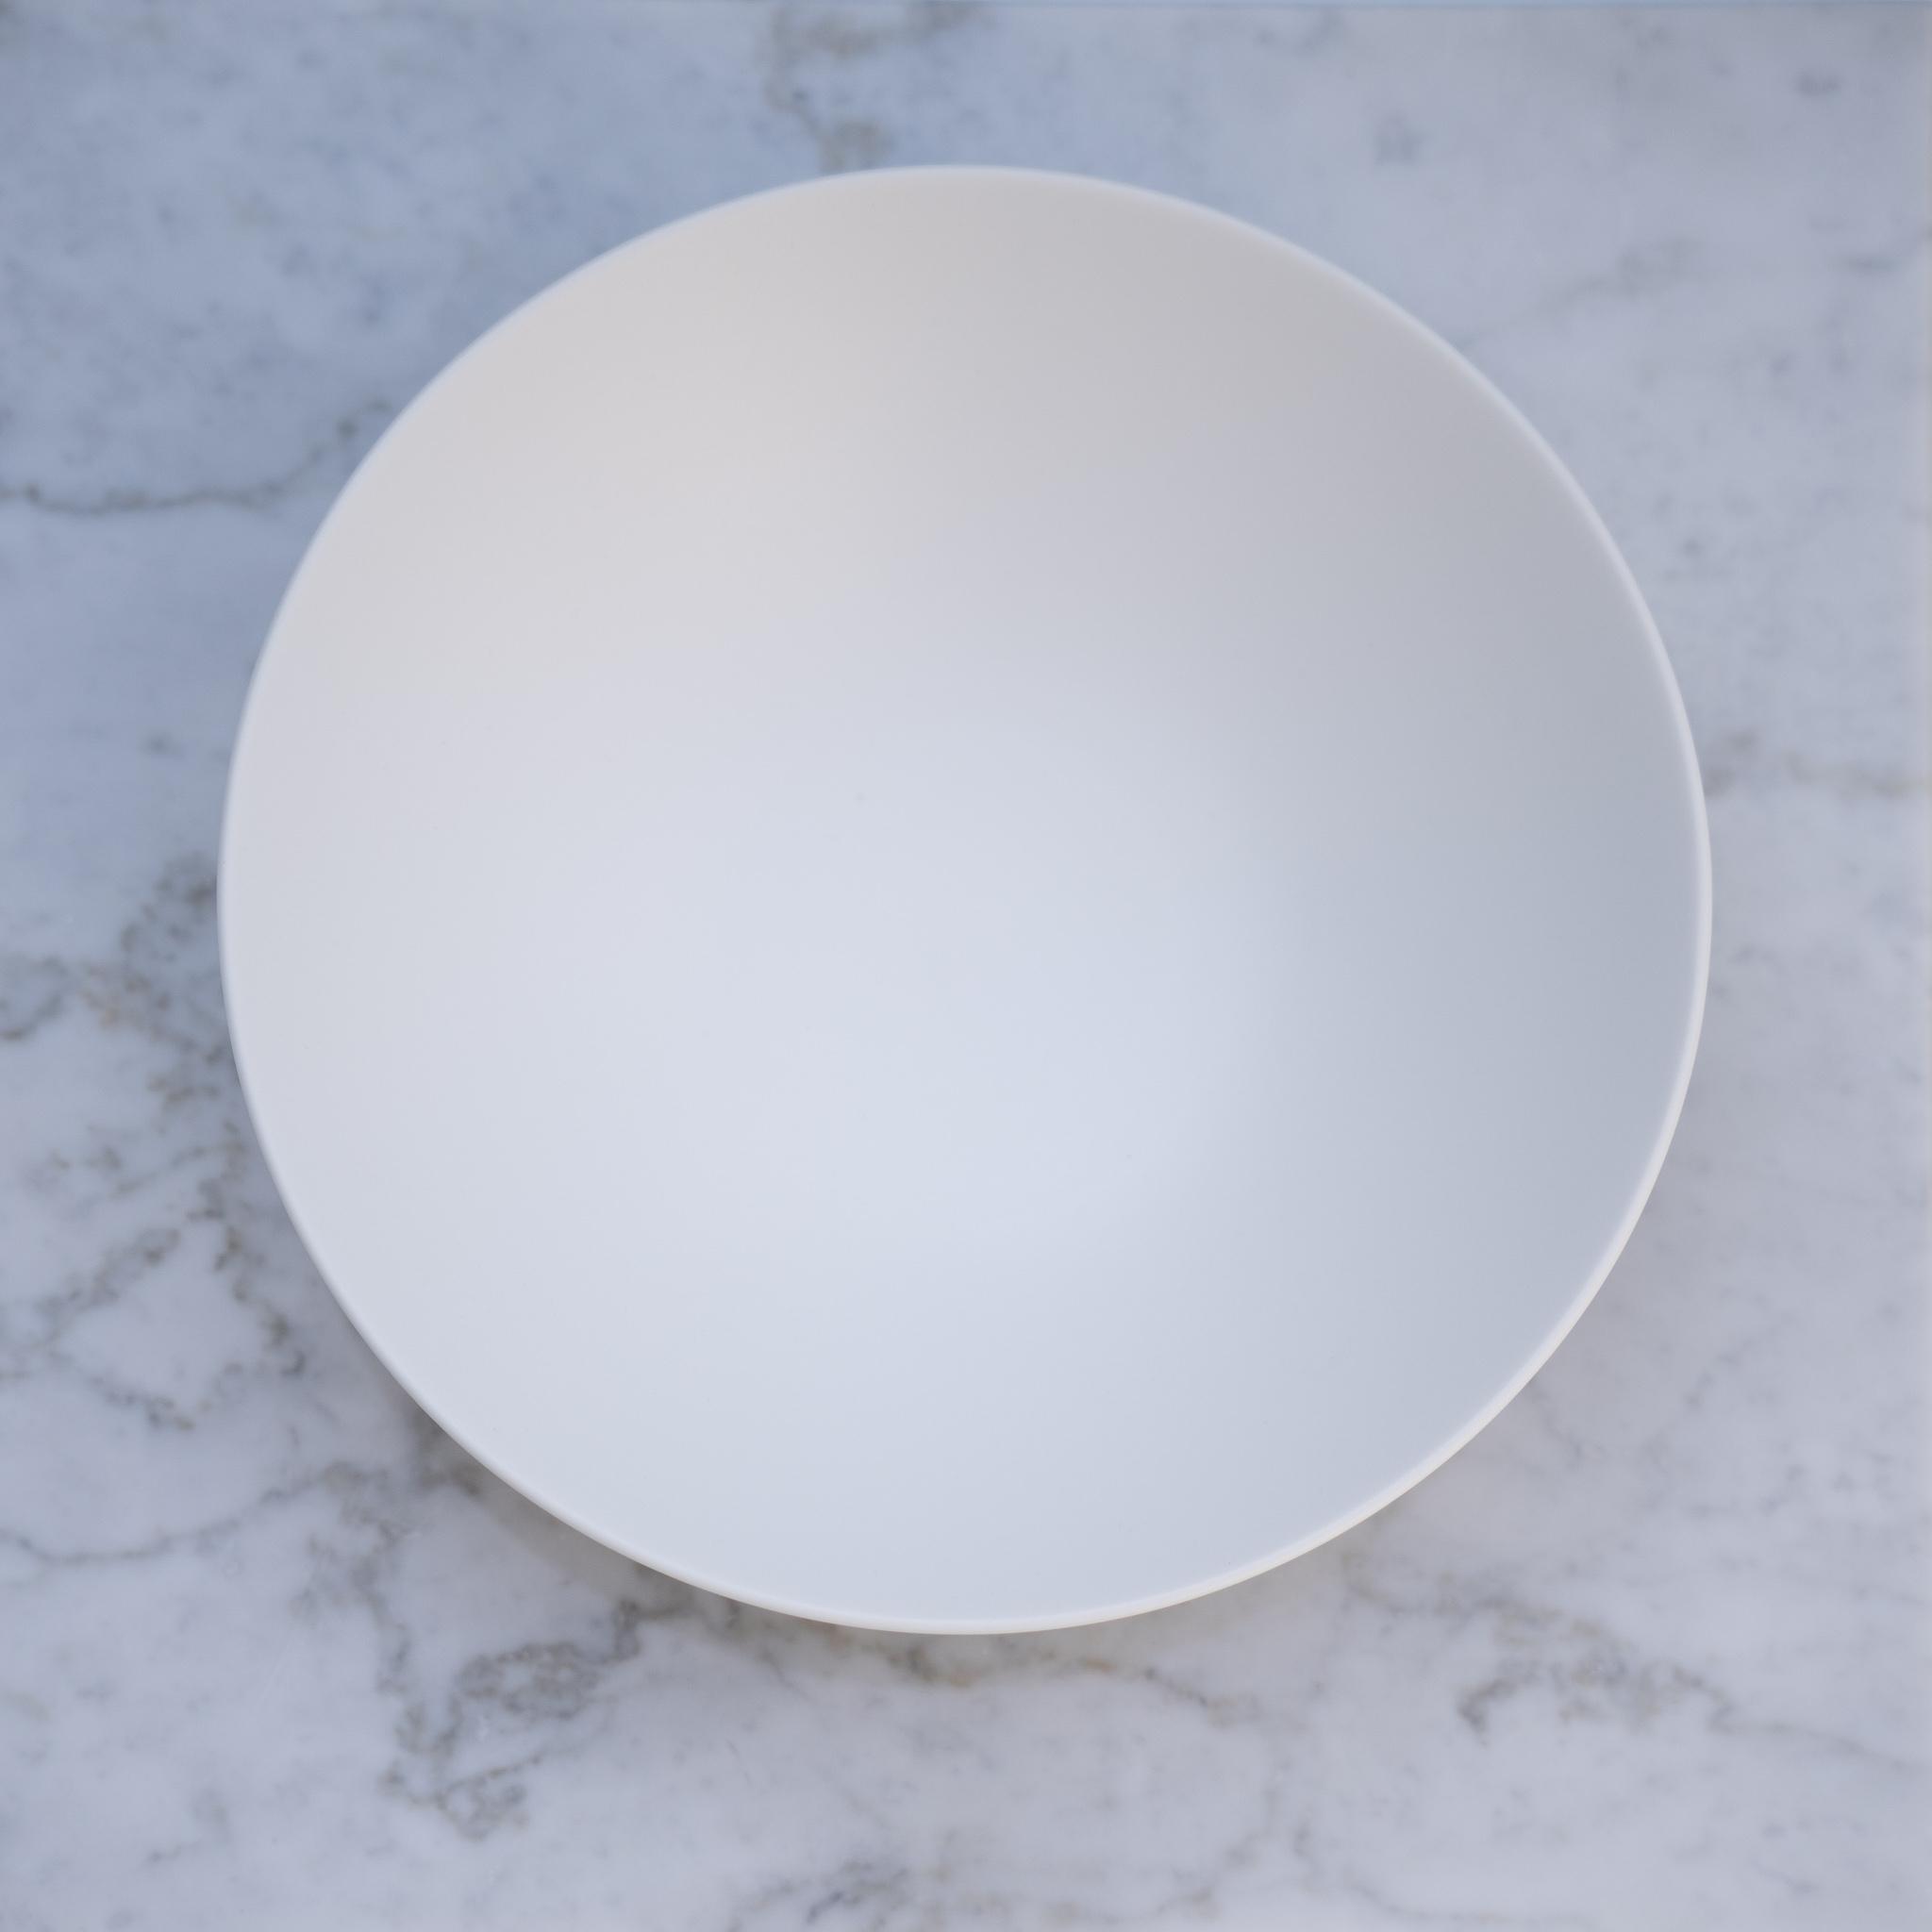 Stoneプレート クープ皿  ホワイト 21㎝